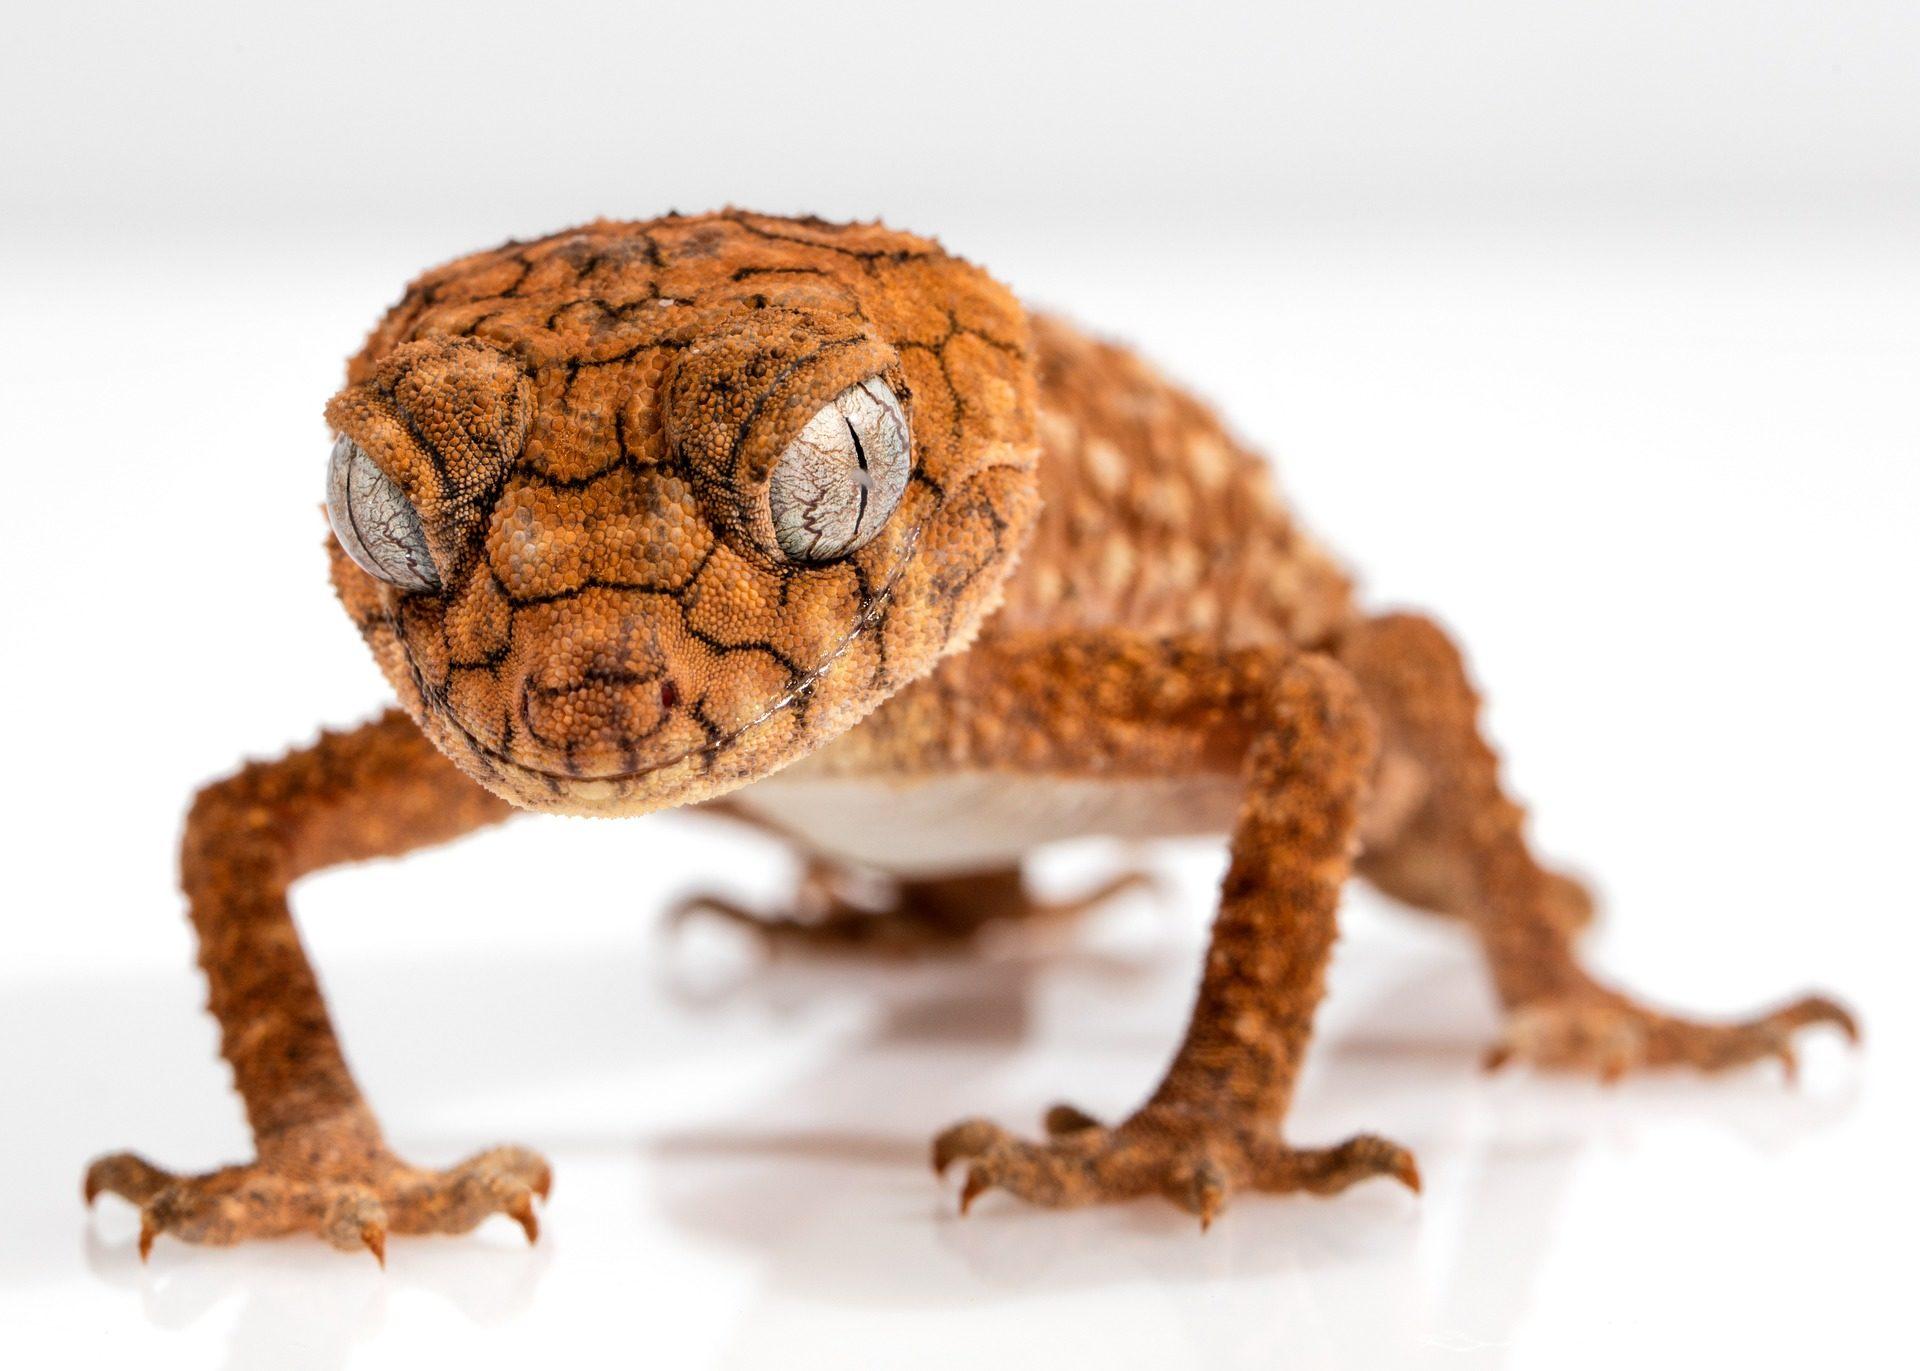 lagarto, Gecko, lucertola, gambe, occhi, chiodi, pelle, sguardo - Sfondi HD - Professor-falken.com